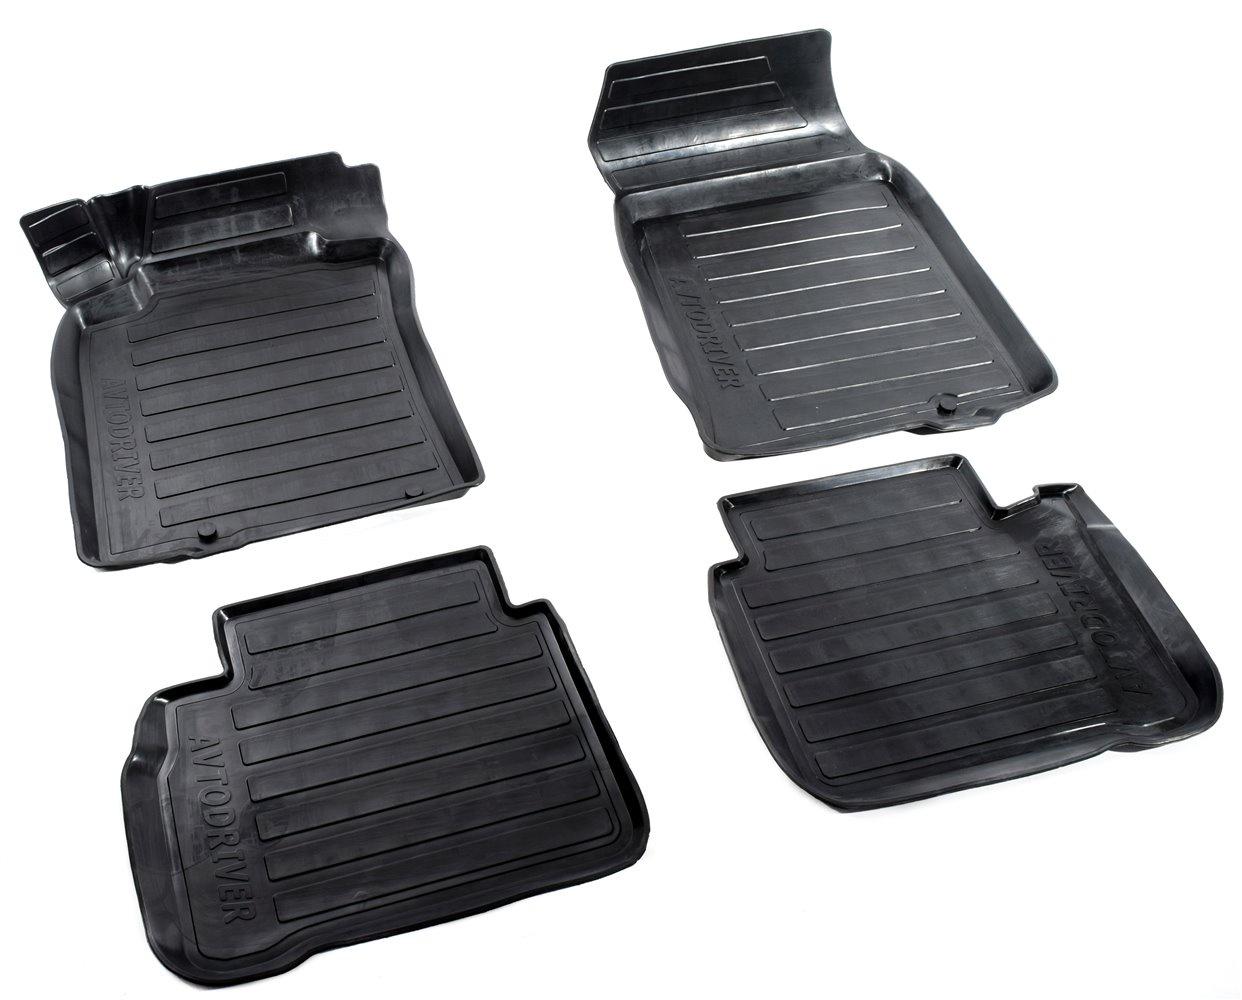 Коврики салона Avtodriver для Nissan Teana (2008-2014) ADRAVG160, резиновые, с бортиком, черный коврики салона avtodriver для renault duster передний привод 2011 adrjet023 резиновые с бортиком черный